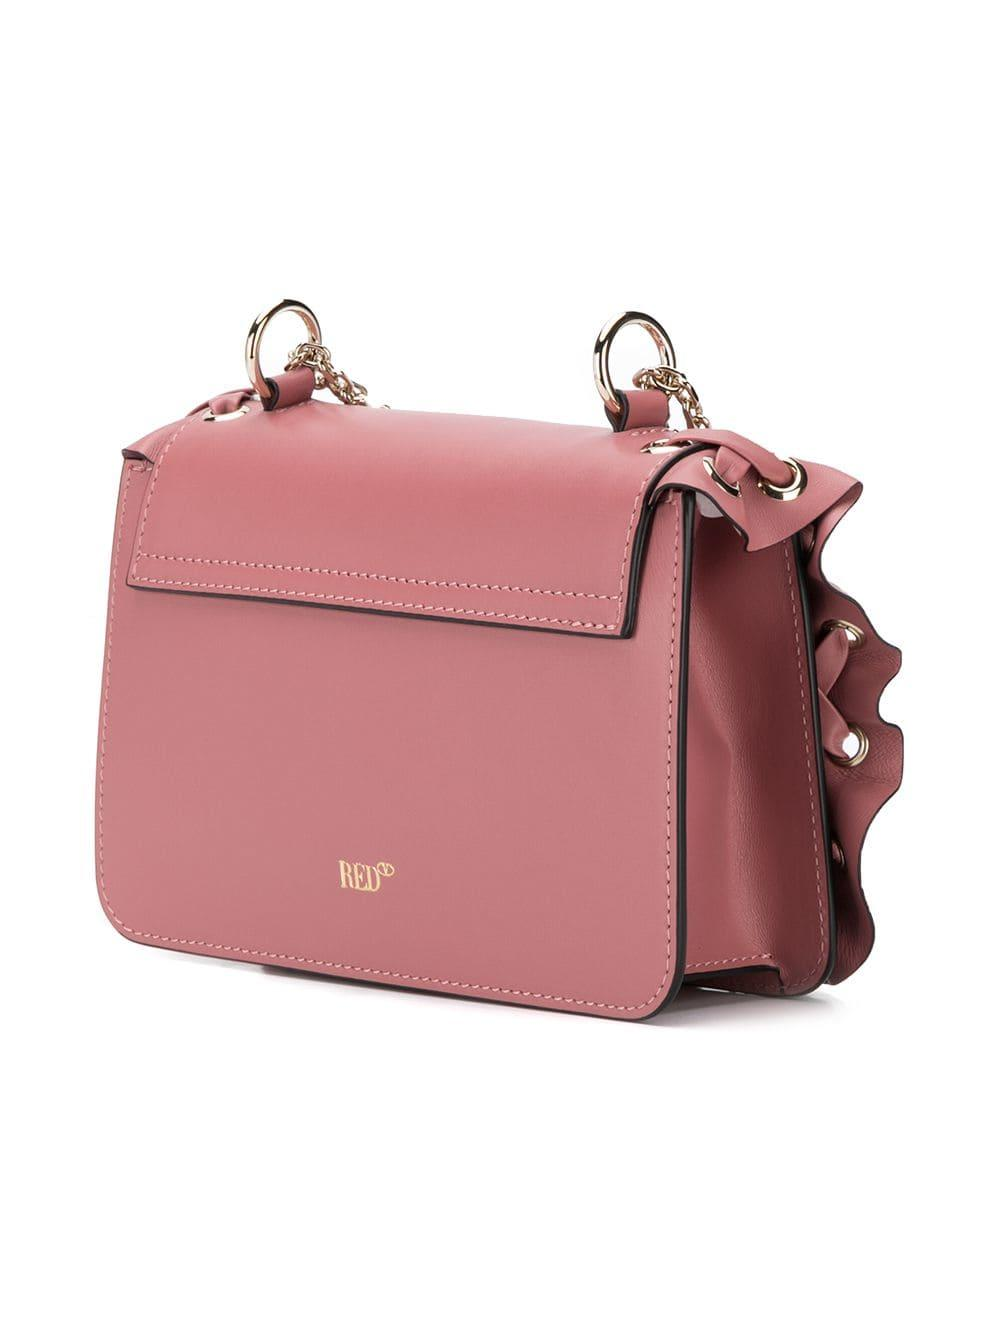 3a7962ed64 RED Valentino Red (v) Rockruffle Shoulder Bag in Pink - Lyst